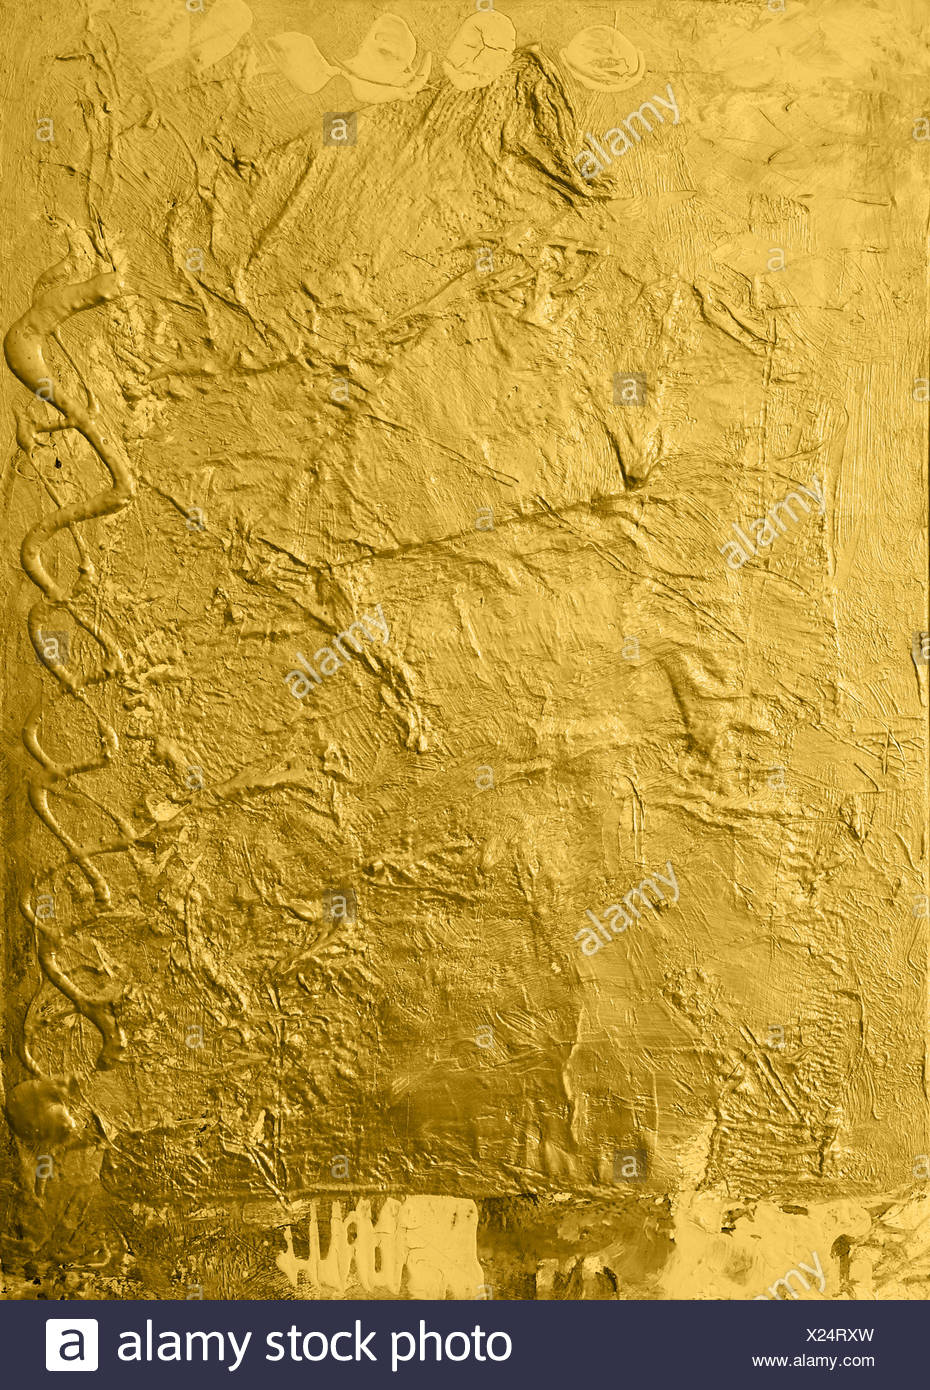 gold background - Stock Image